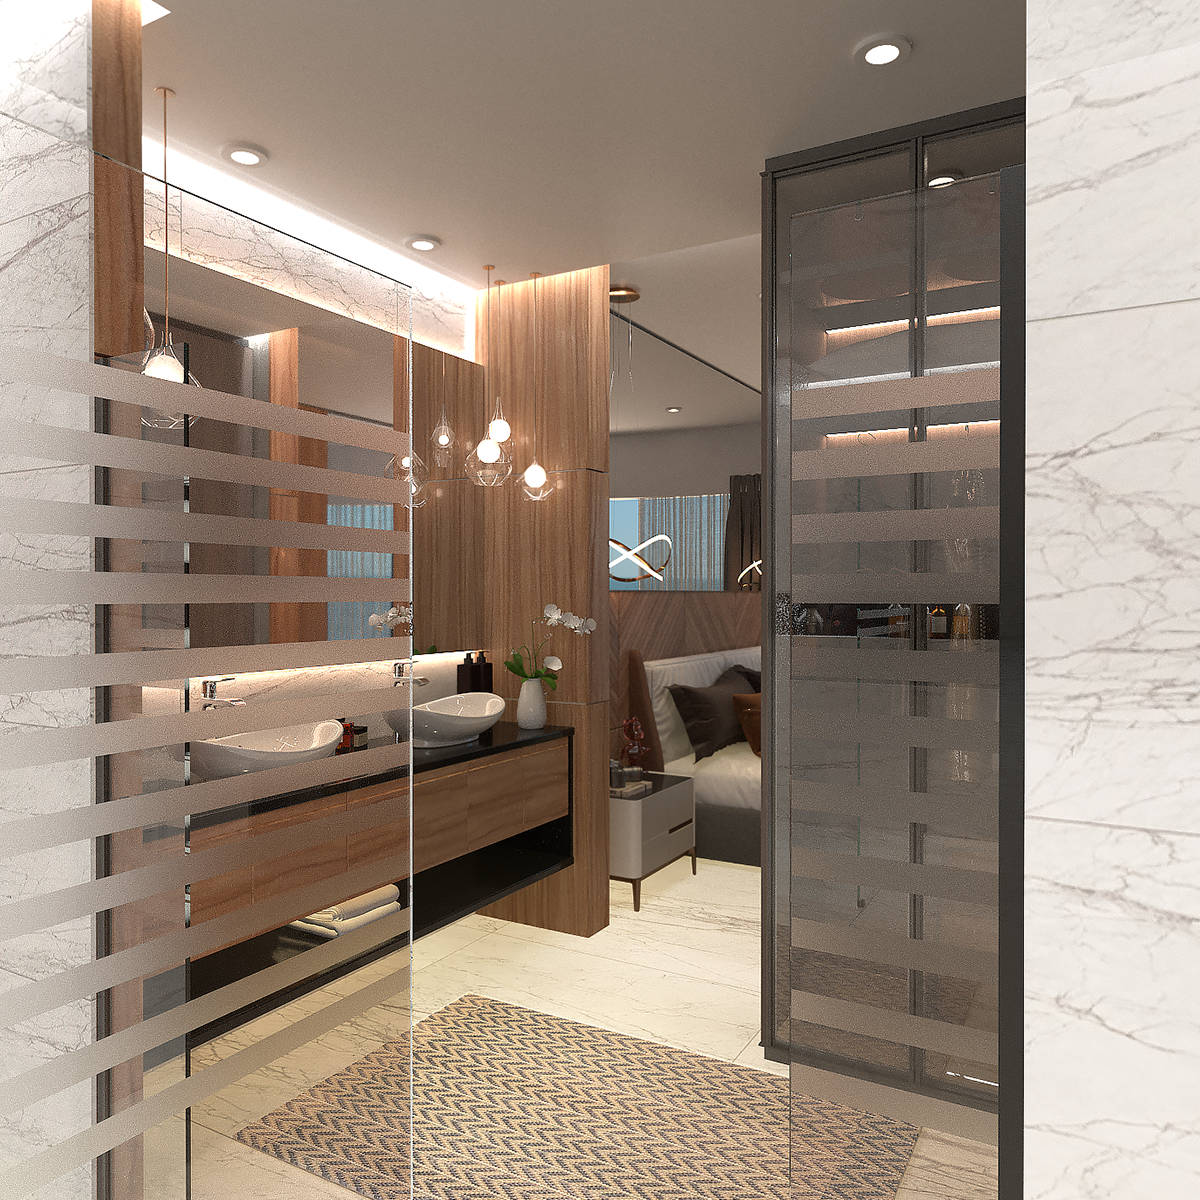 8 de 8: baño de residencia sobre el malecon master penthouse